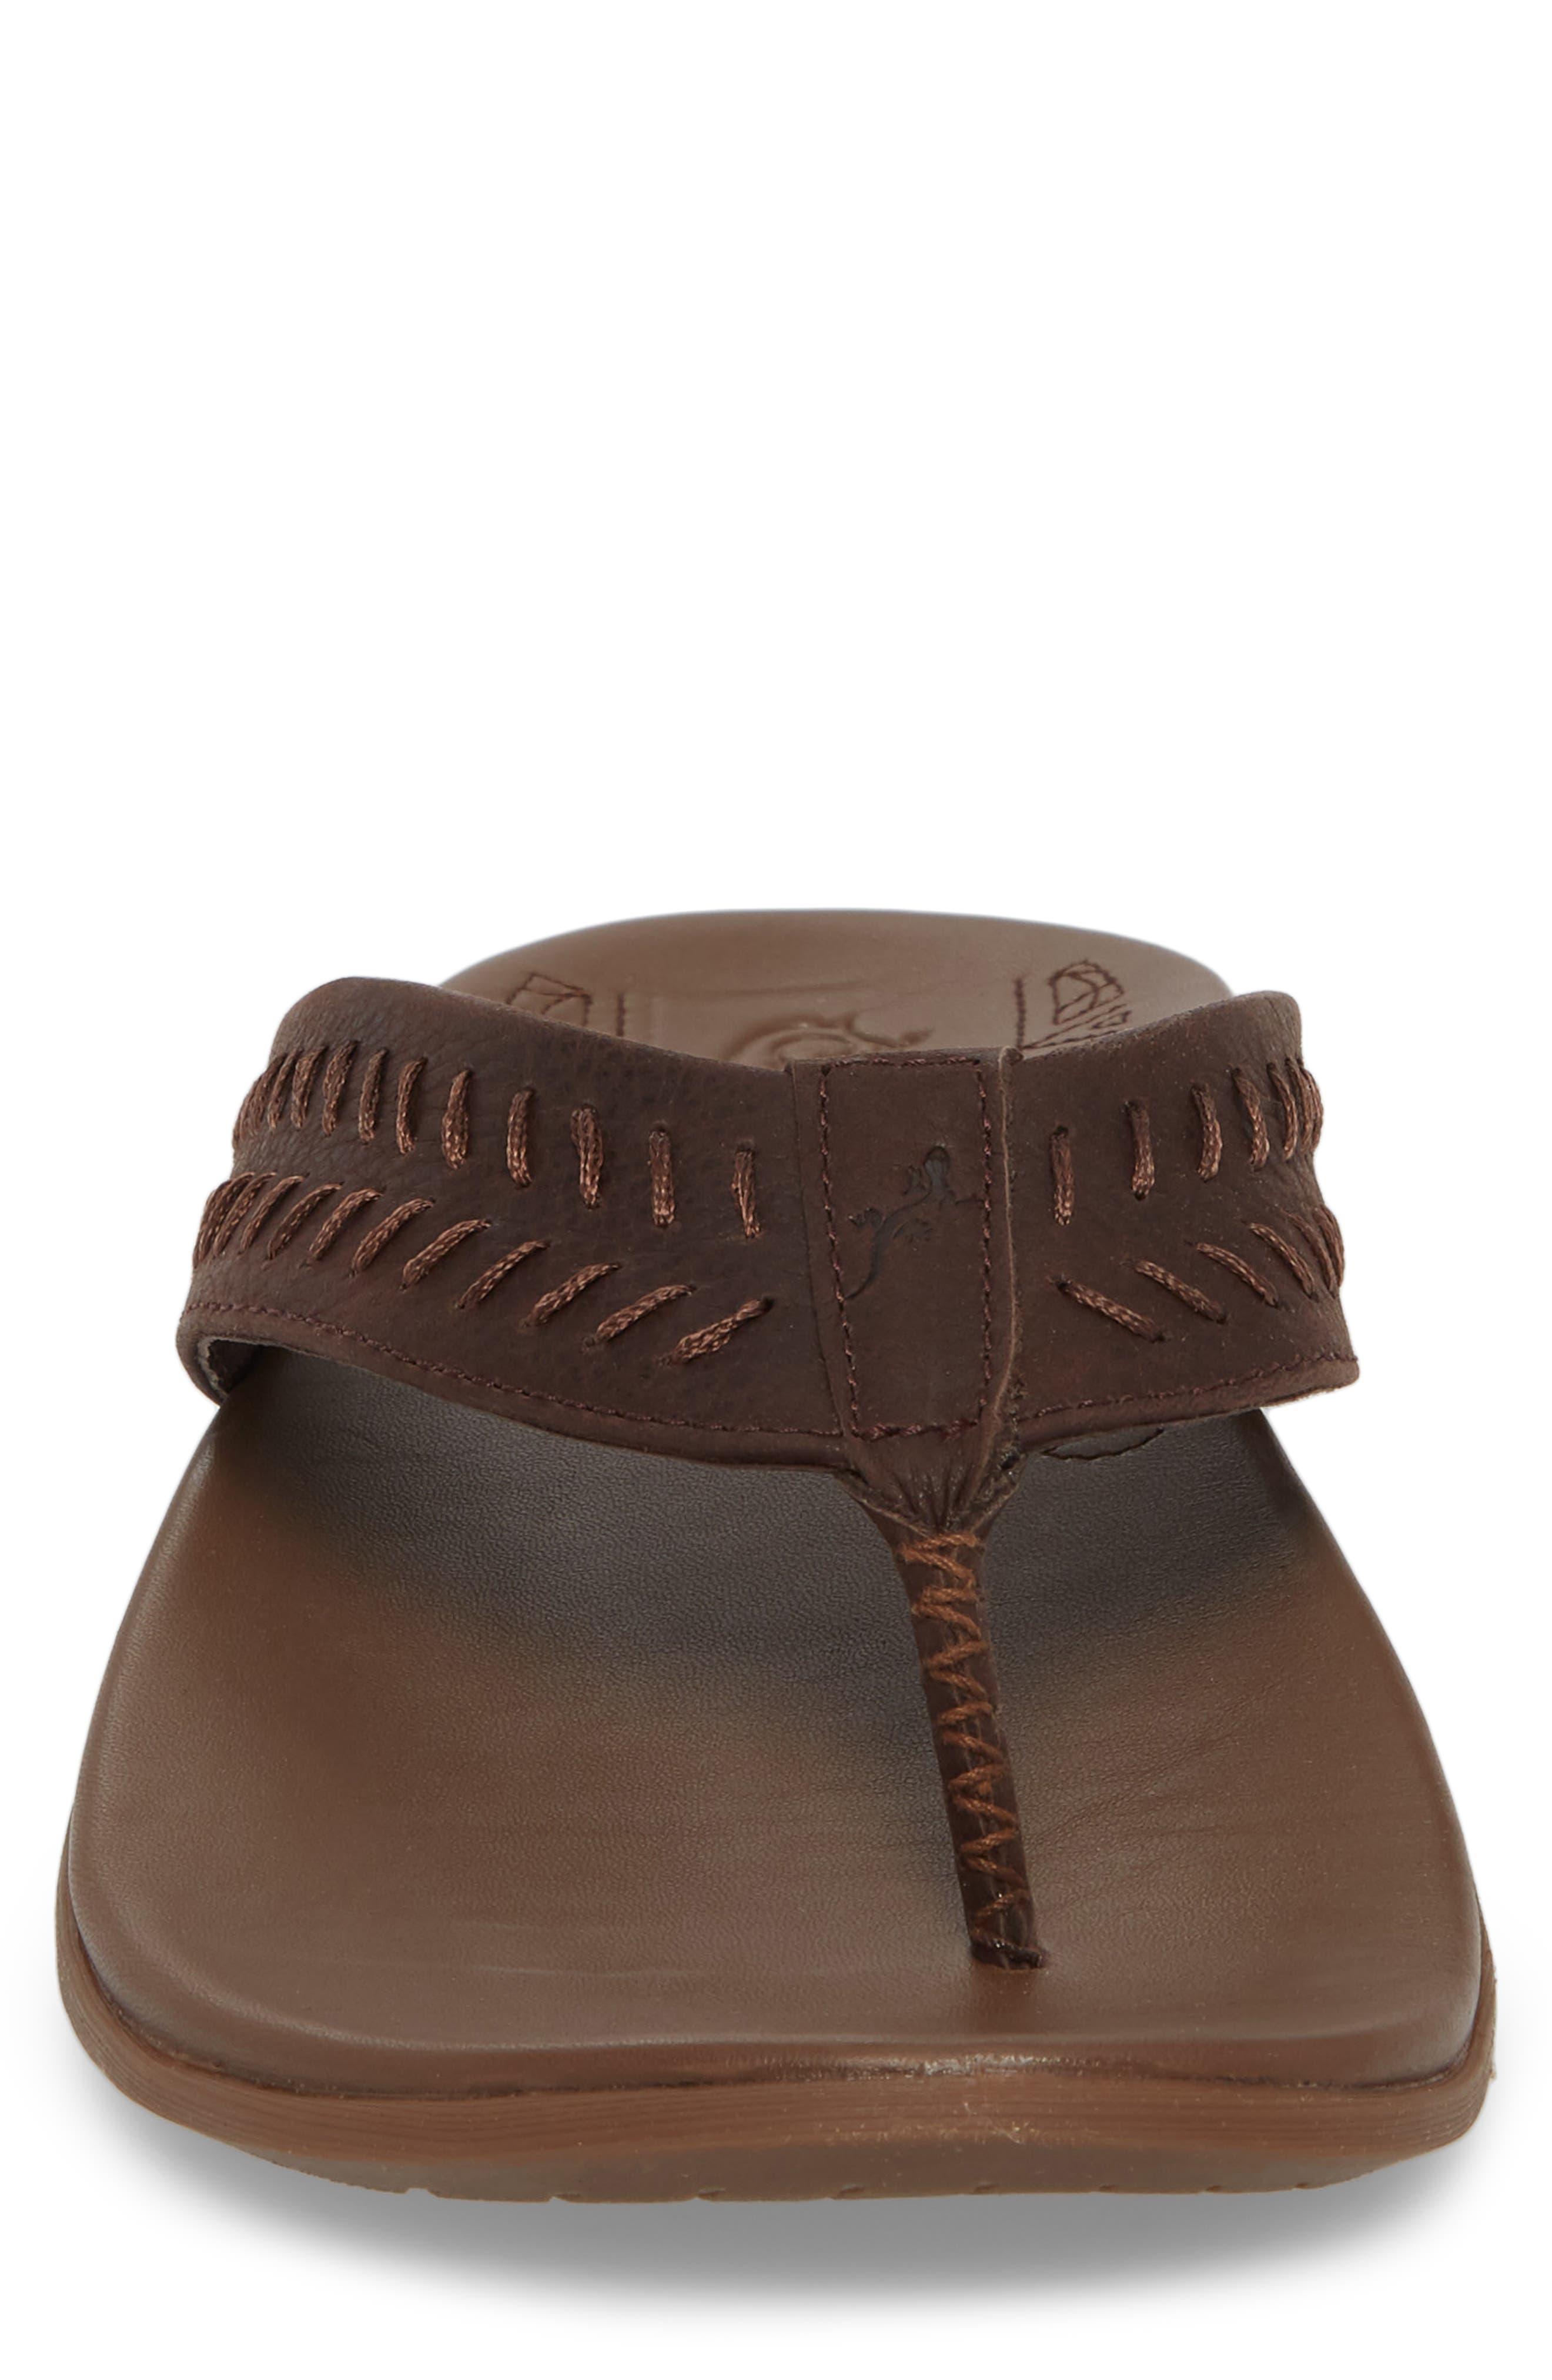 Jackson Flip Flop,                             Alternate thumbnail 4, color,                             Java Leather